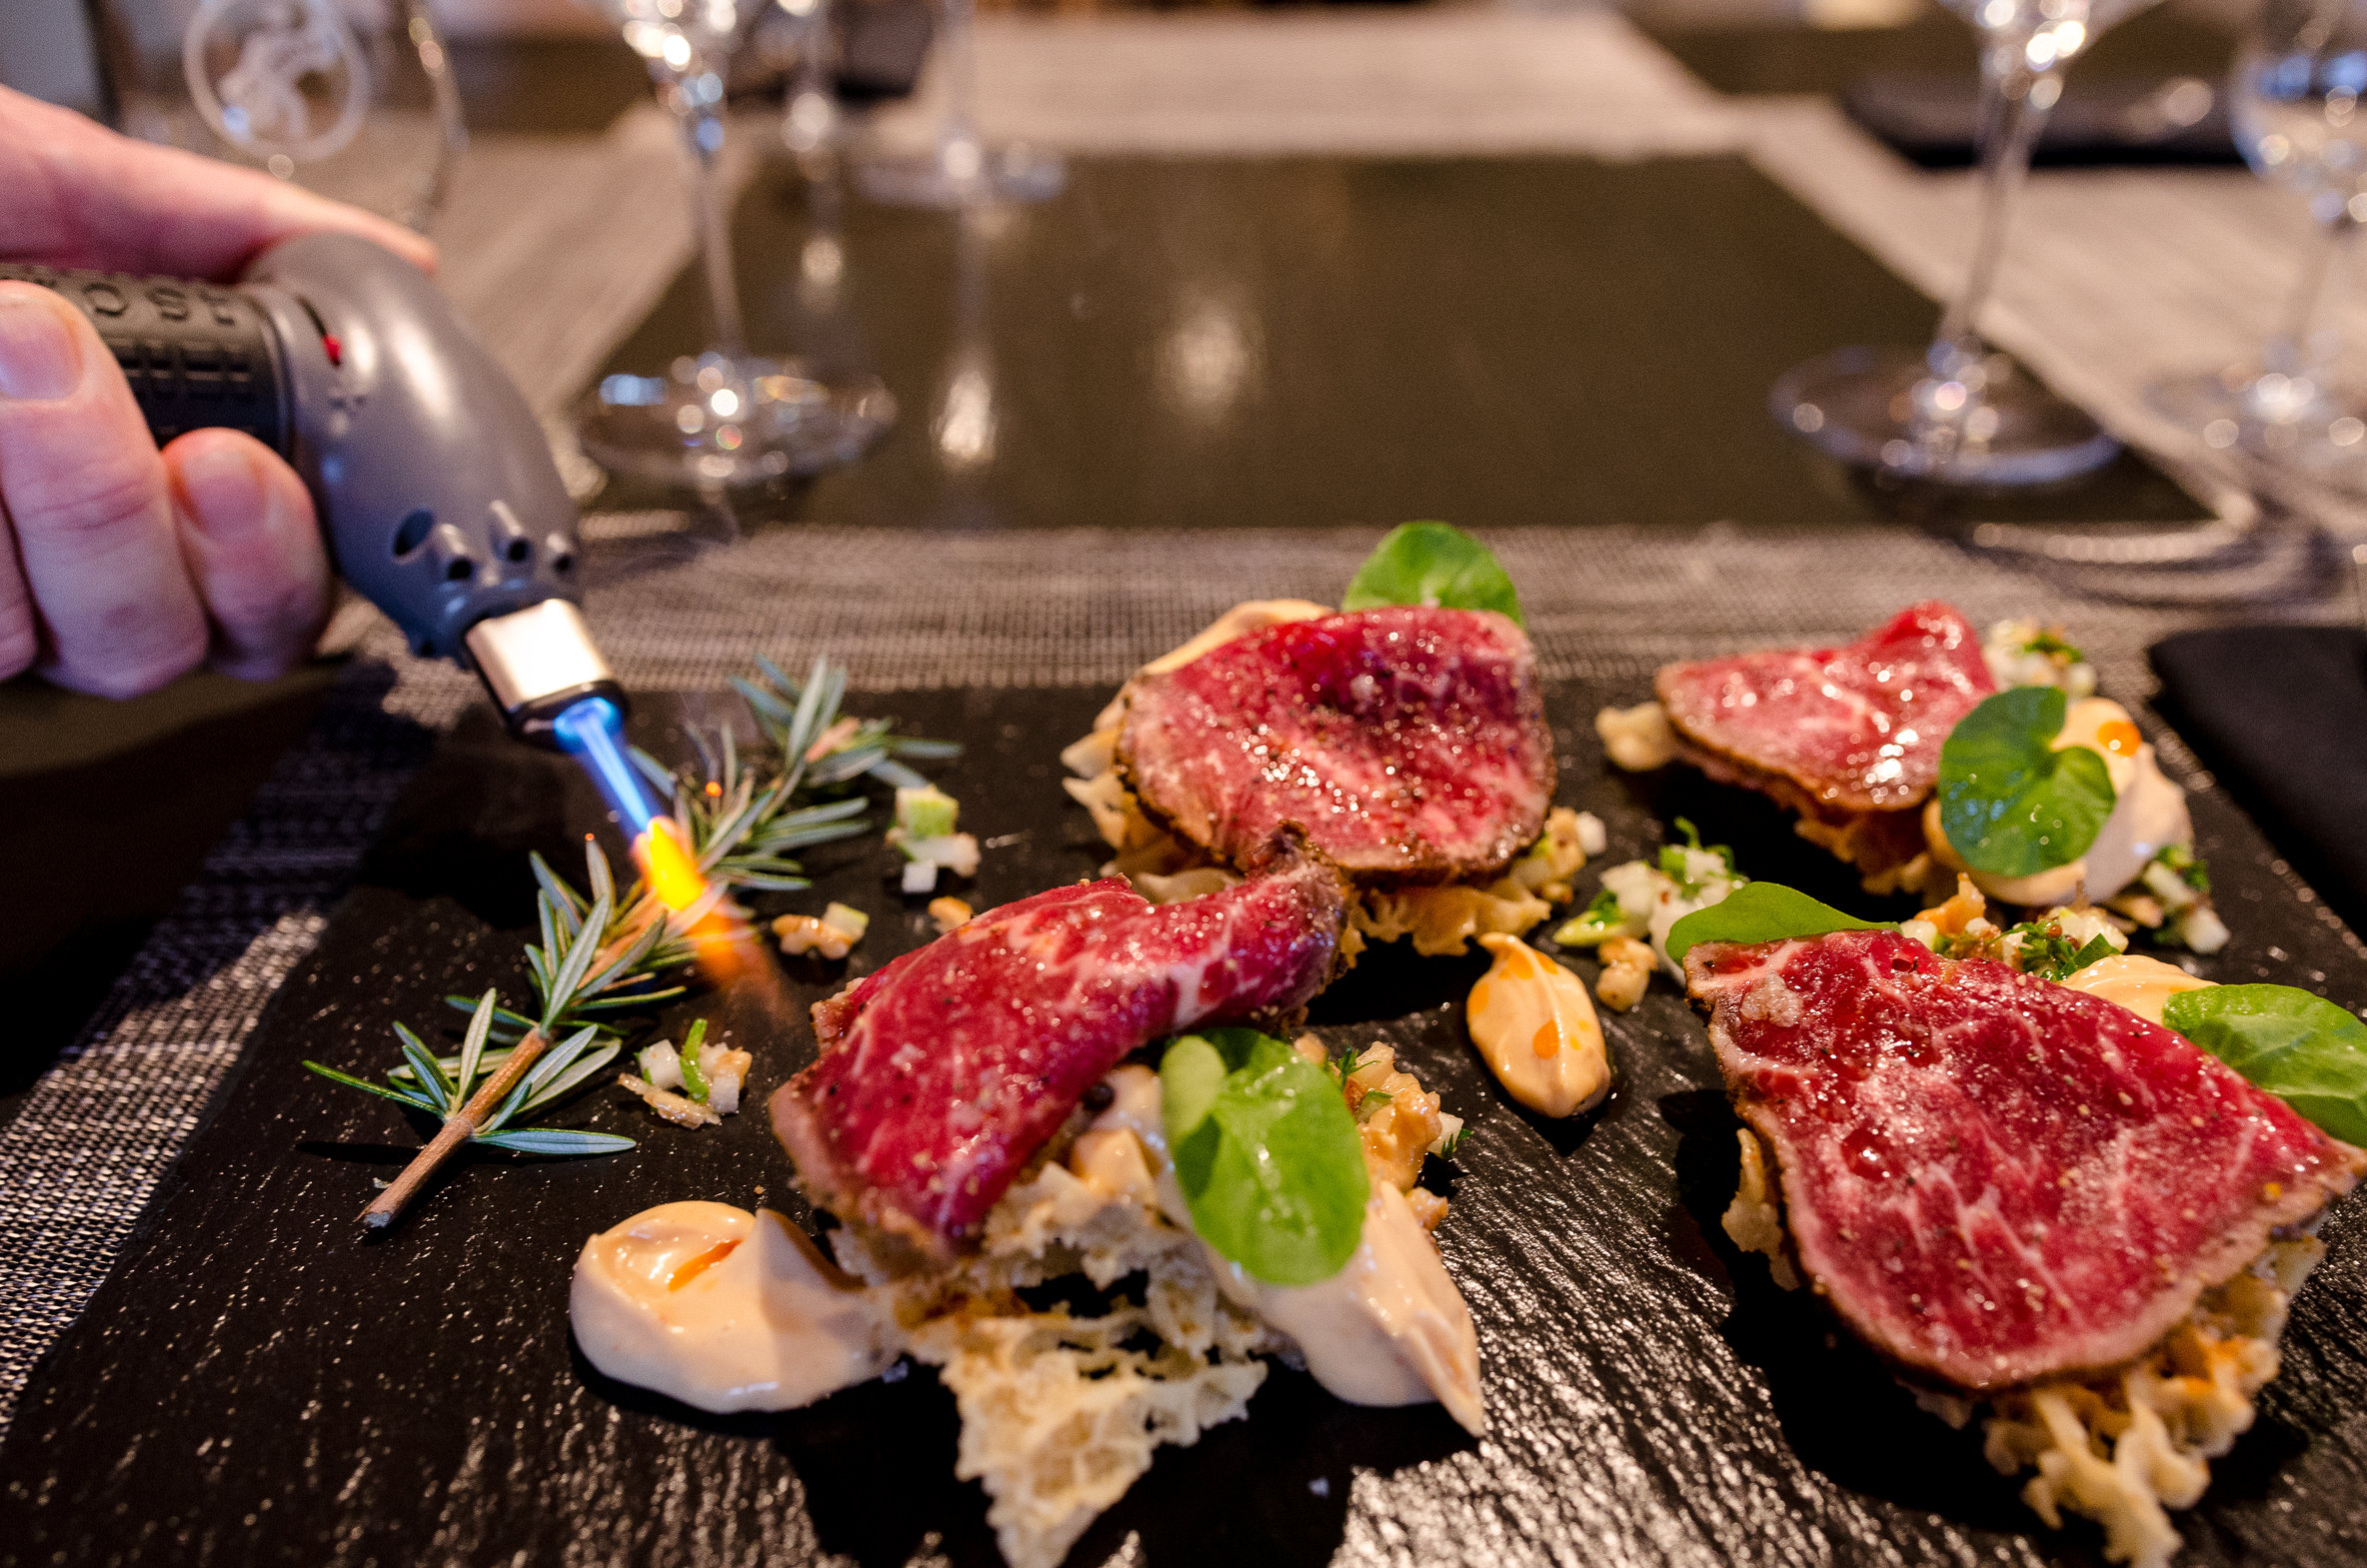 Go Vino - Beef Sashimi